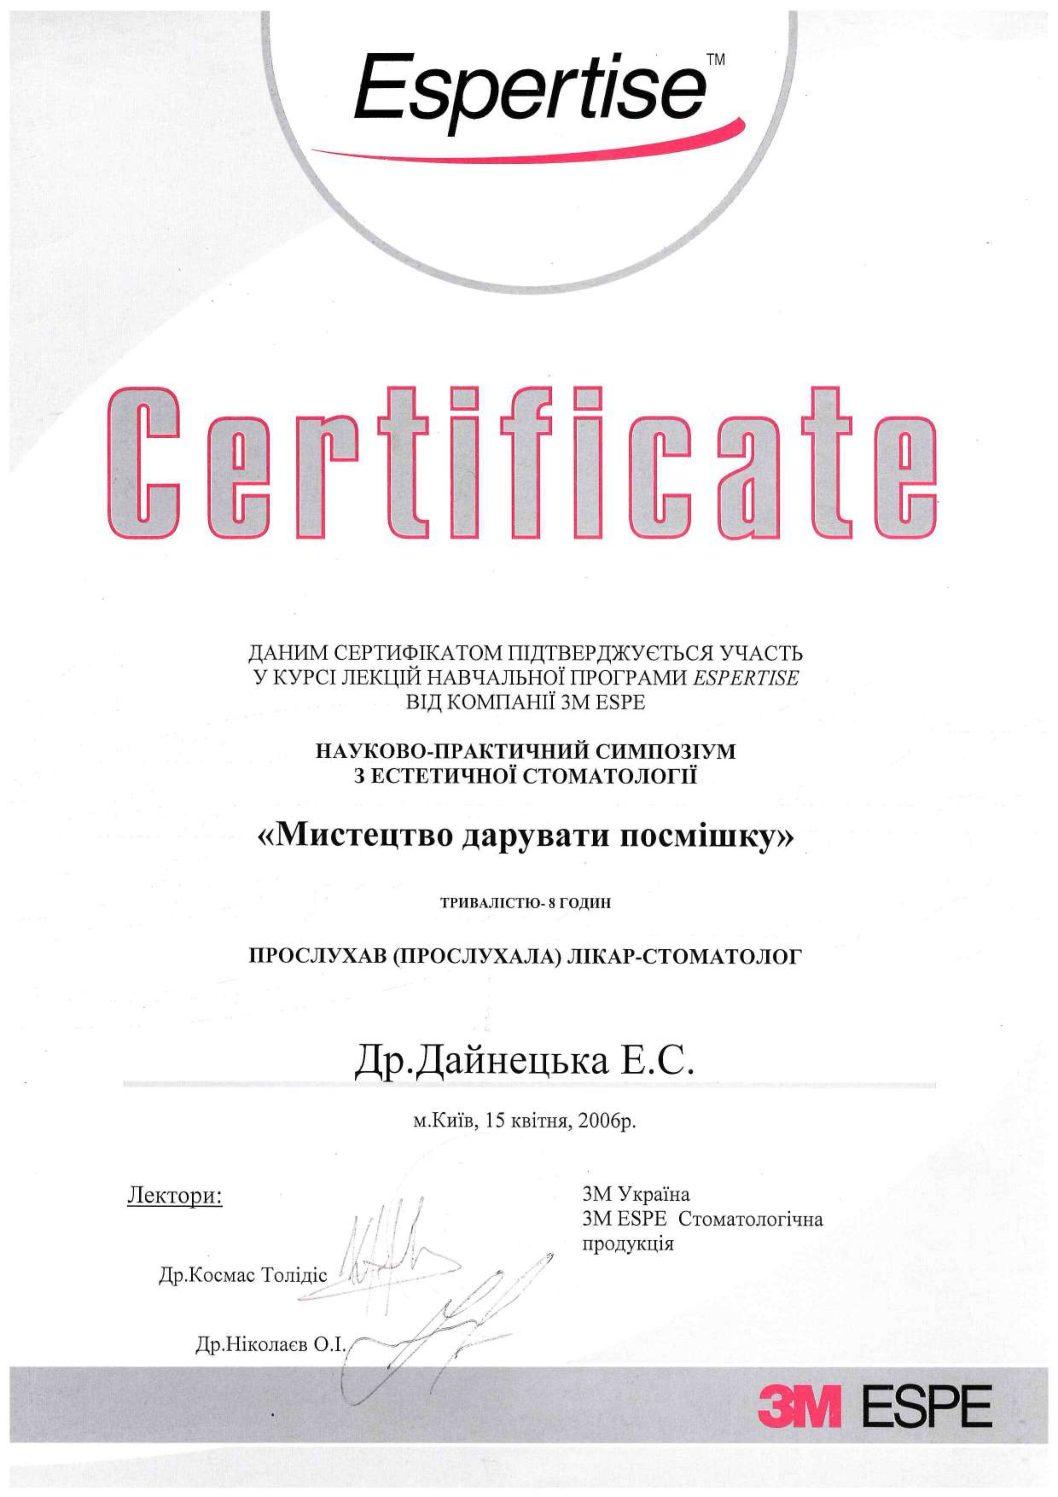 Untitled.FR33.tif compressed pdf - Олена Дайнецька